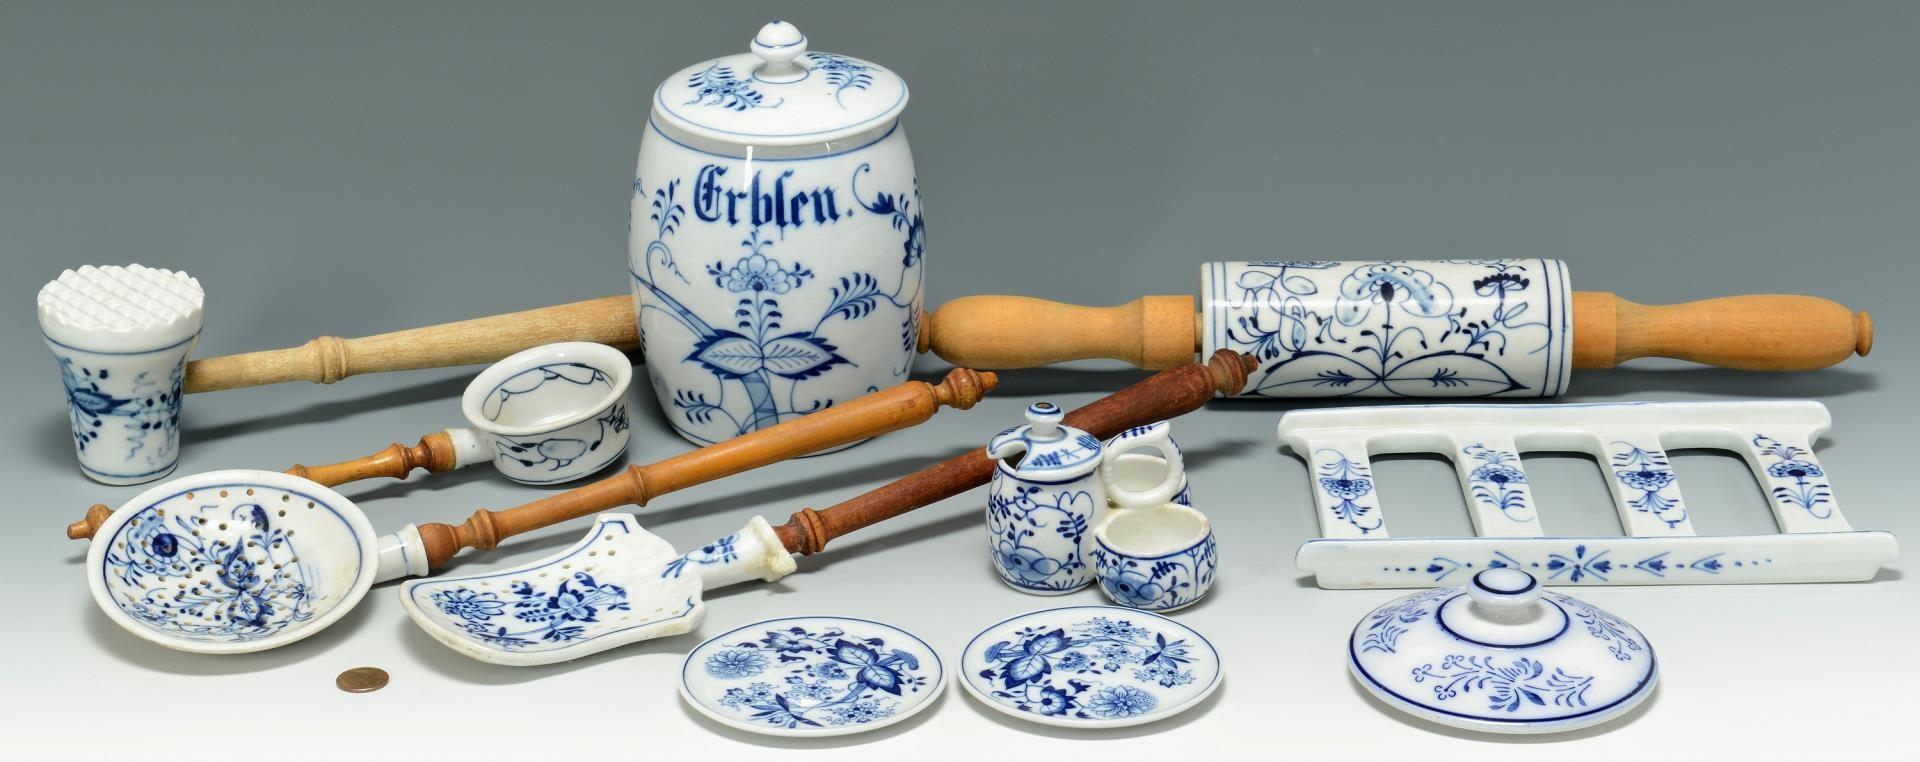 Lot 3383263: 11 Blue Onion Kitchen Items